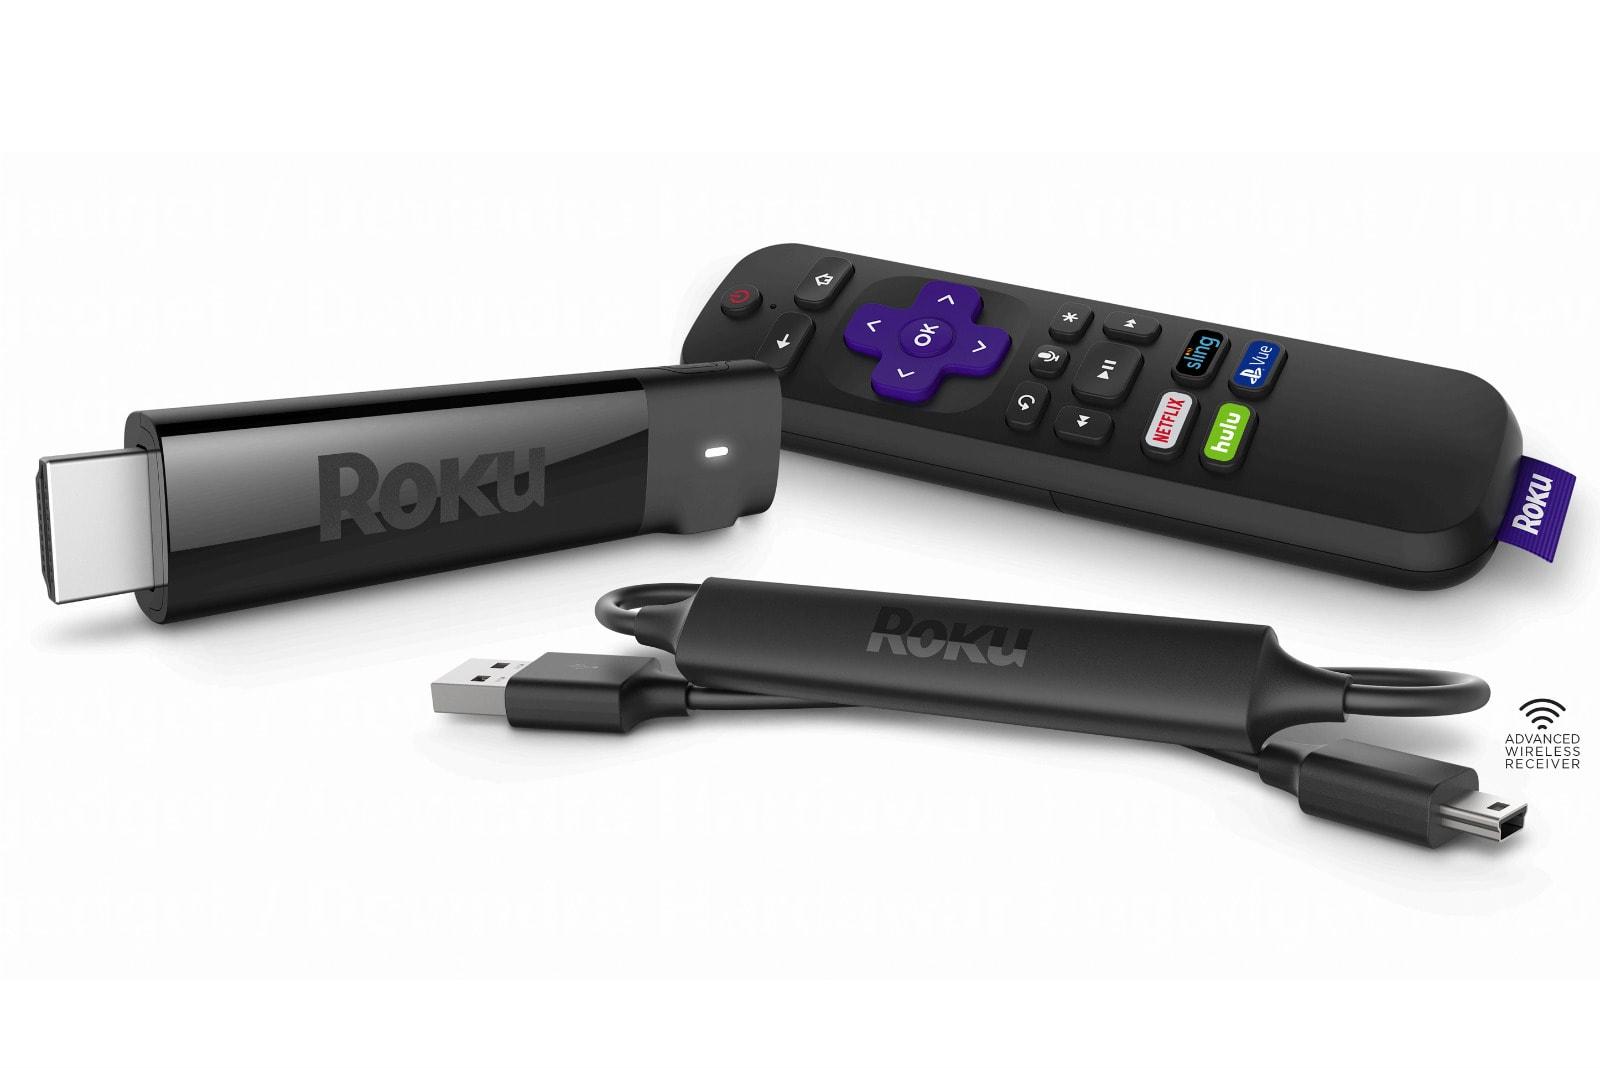 Roku made a 4K streaming stick